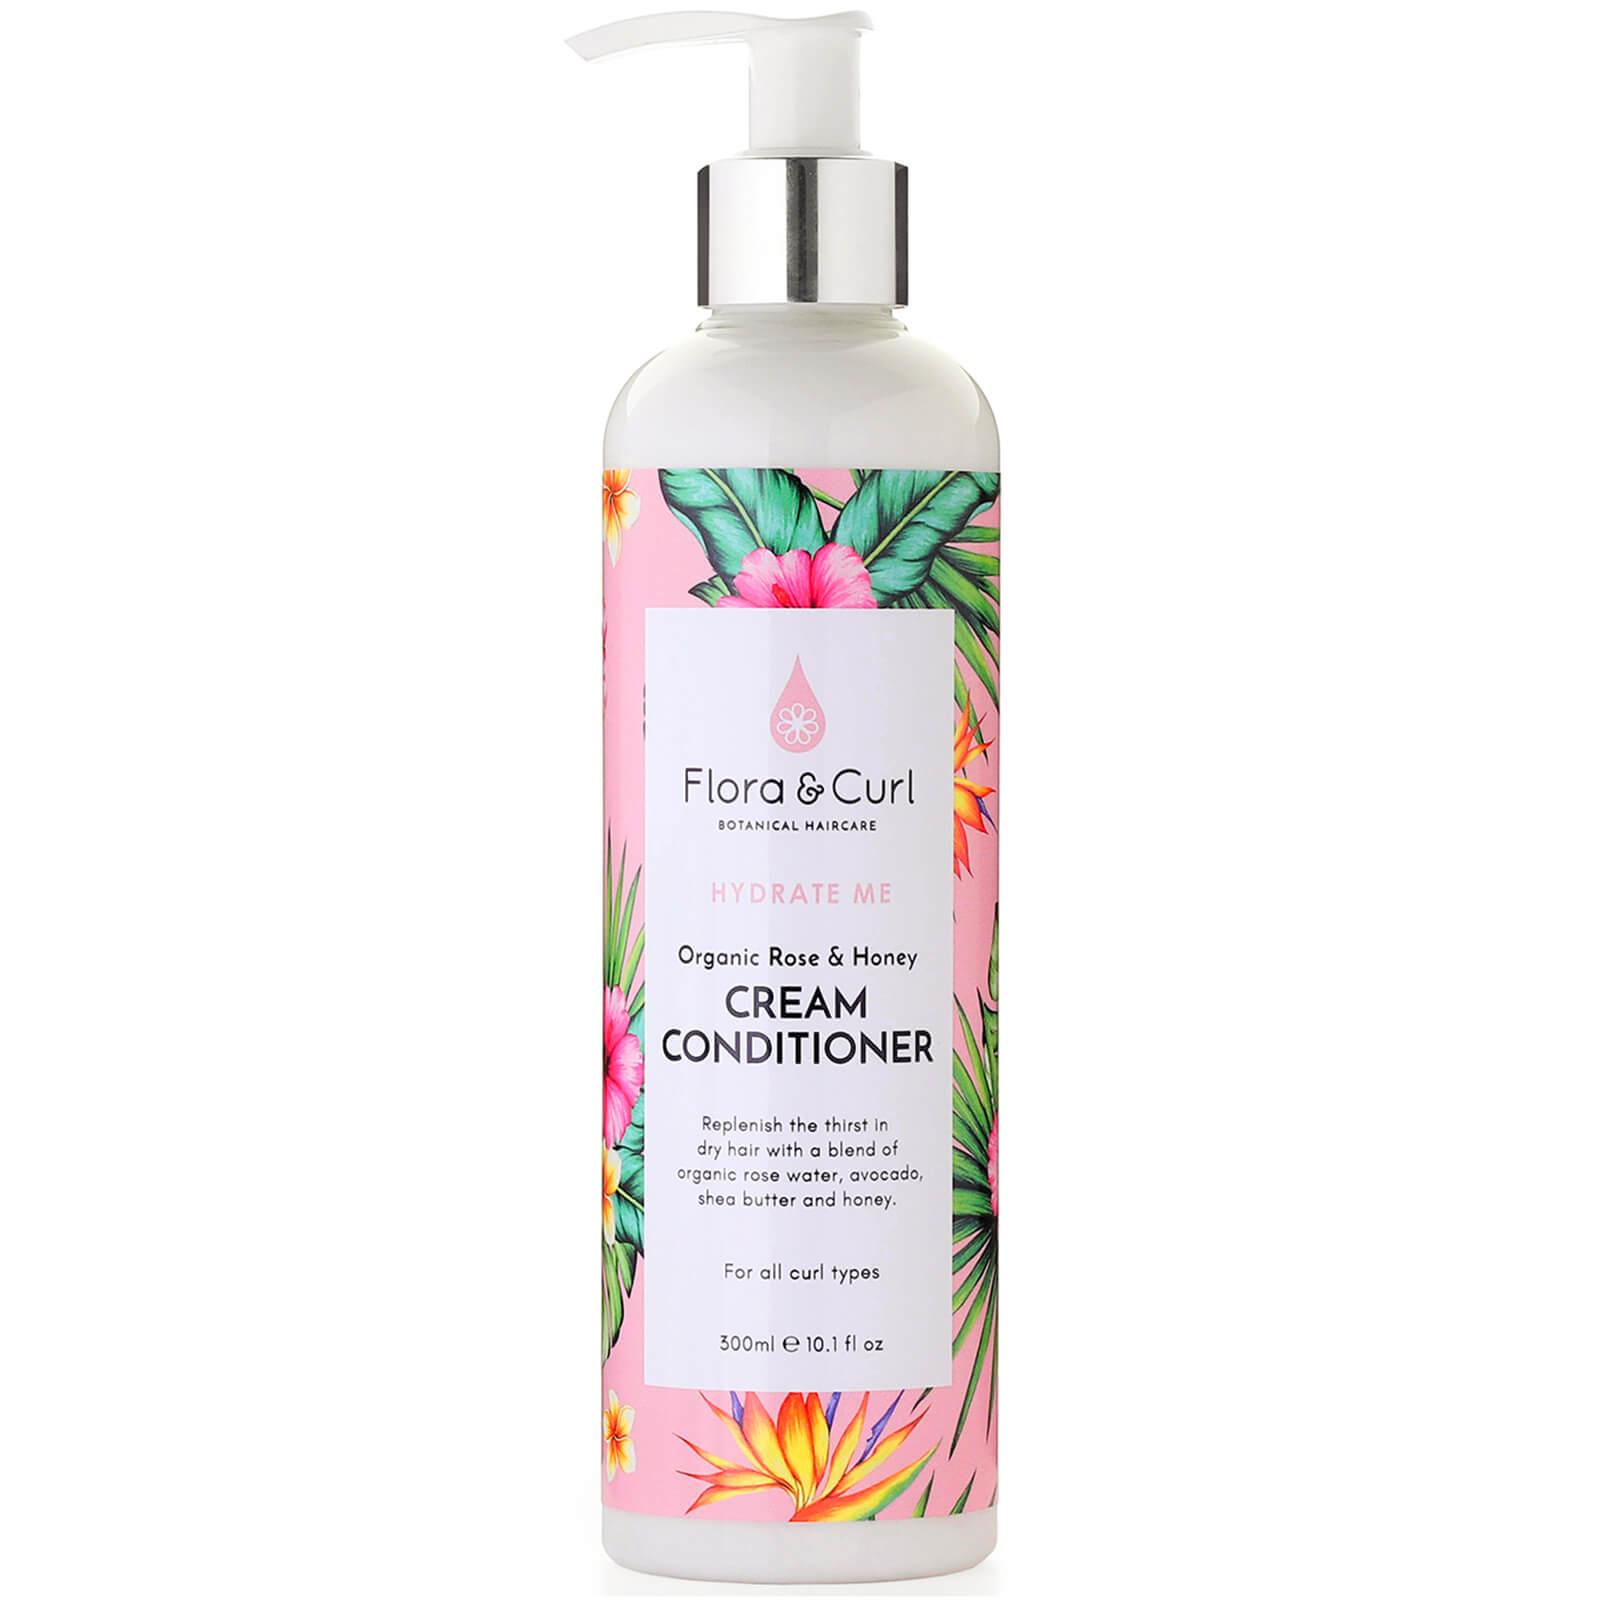 Купить Flora & Curl Organic Rose & Honey Cream Conditioner 300ml